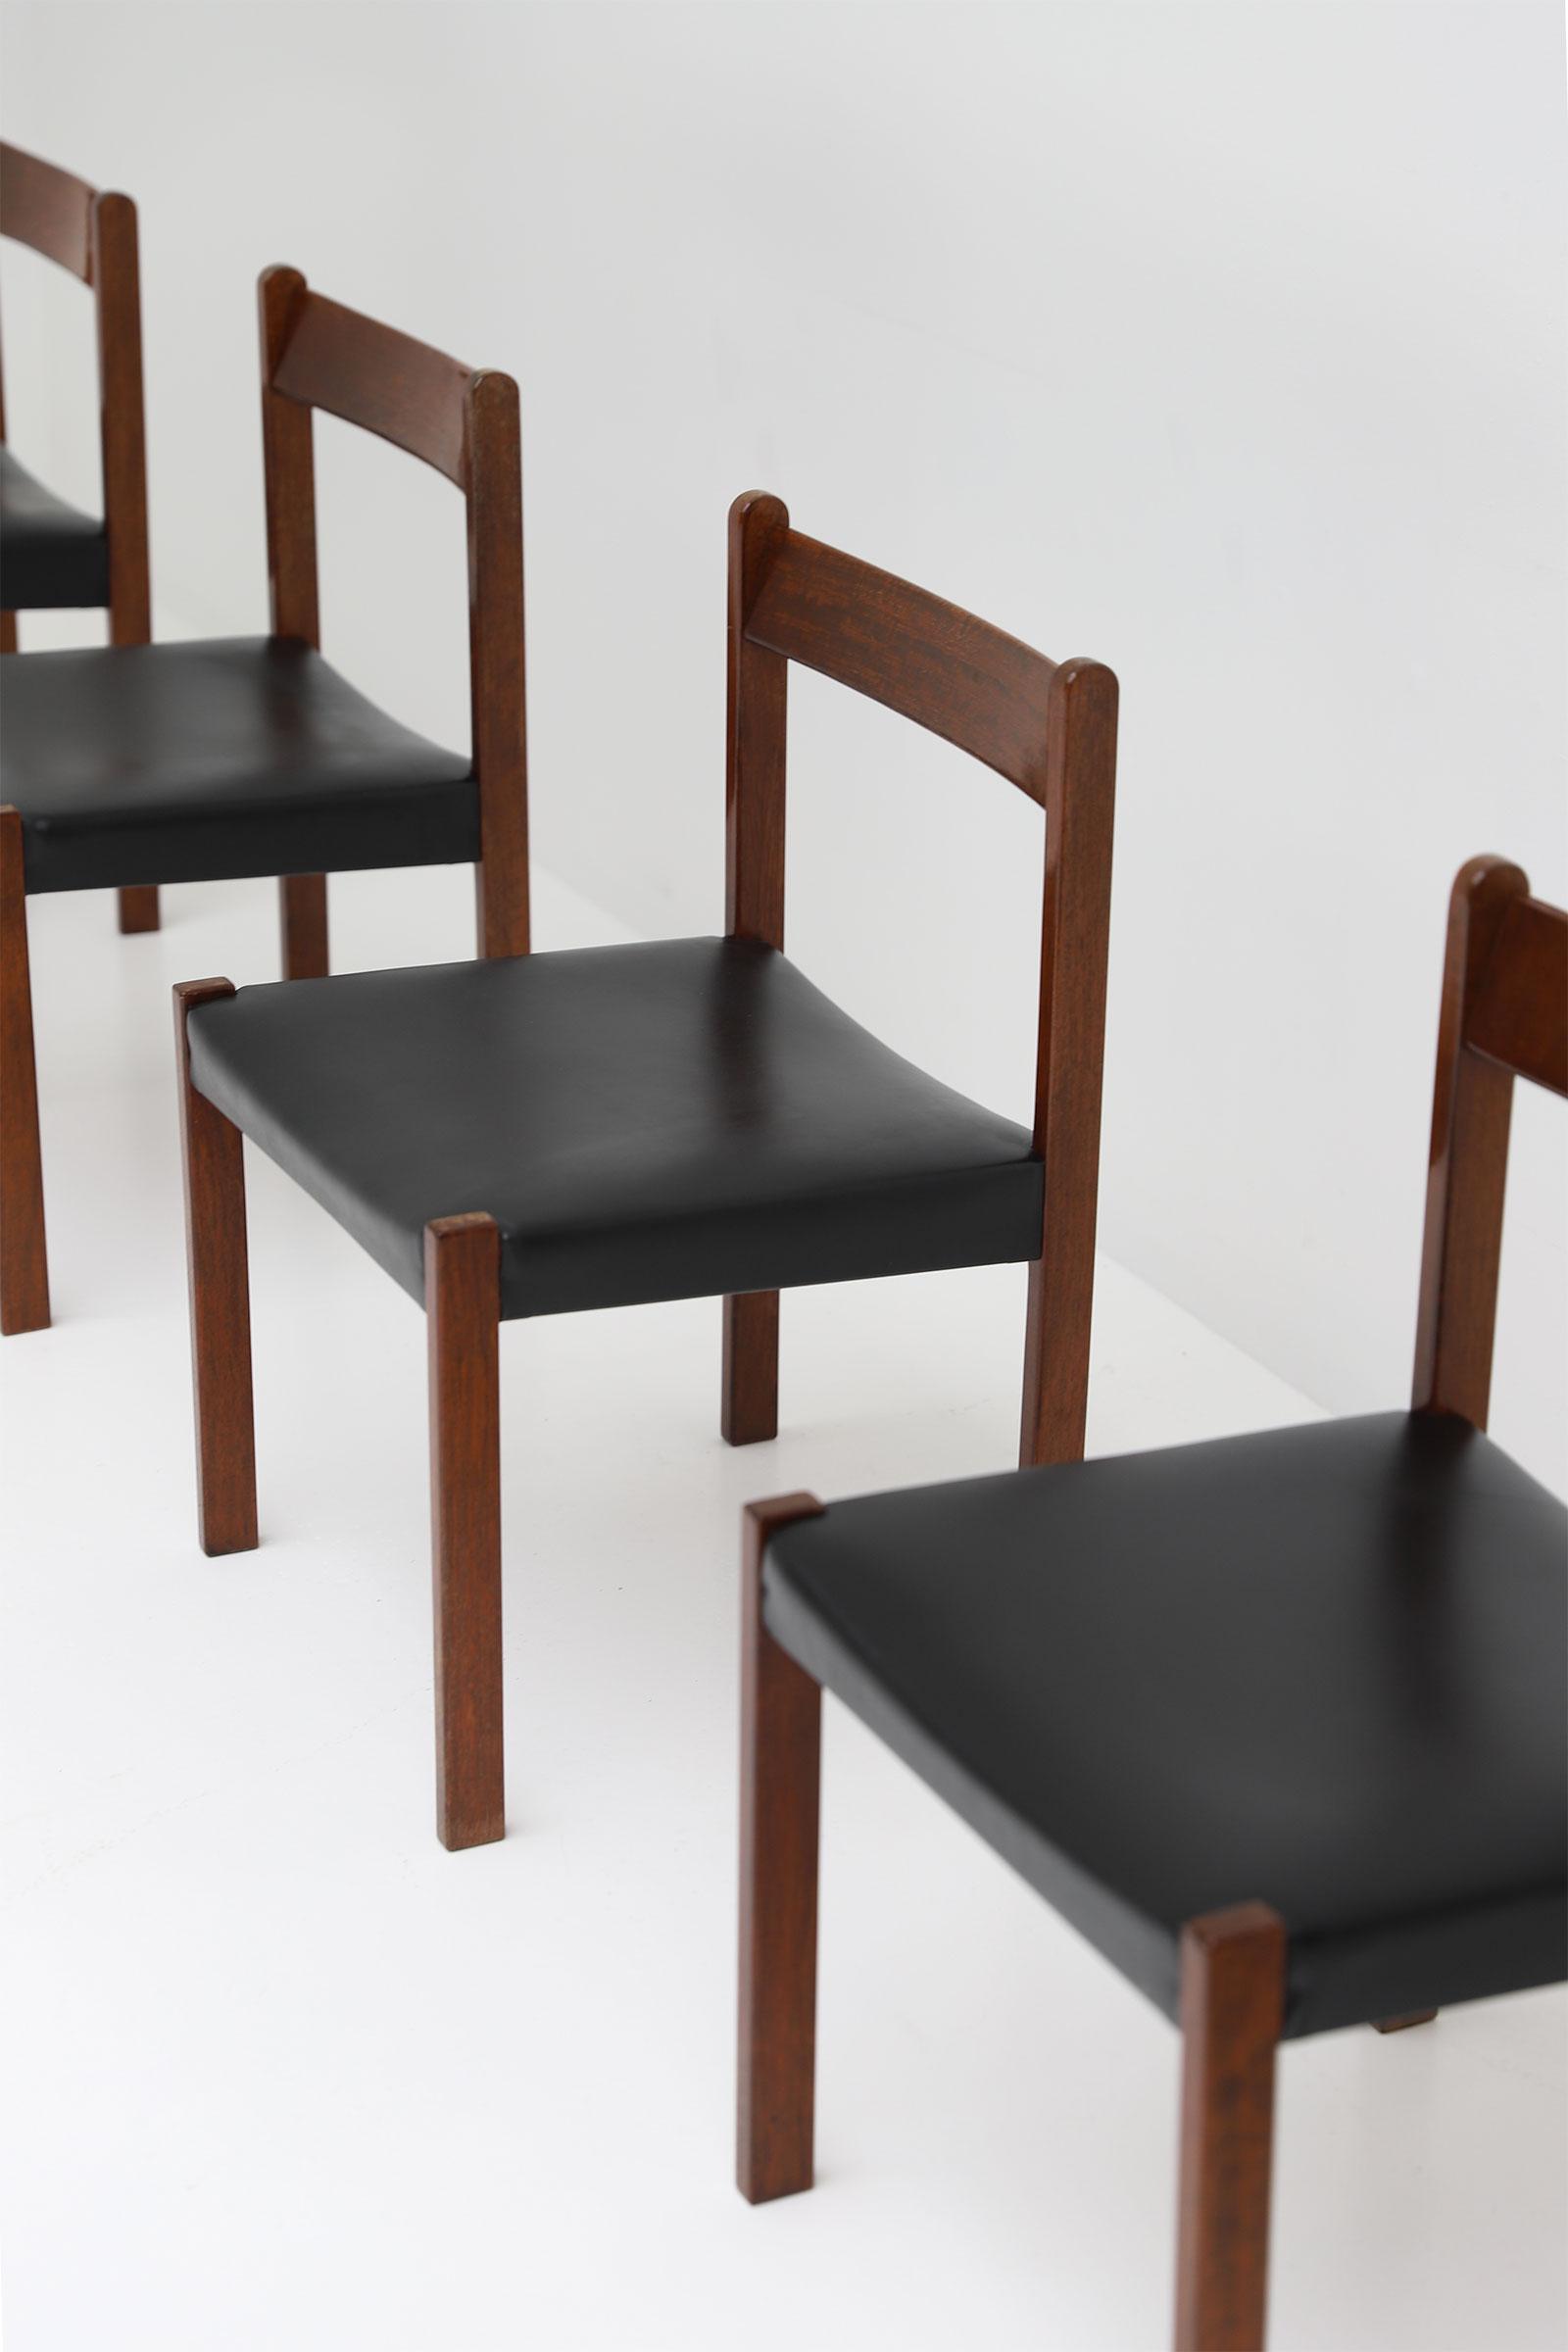 Alfred Hendrickx Belform Chairsimage 4